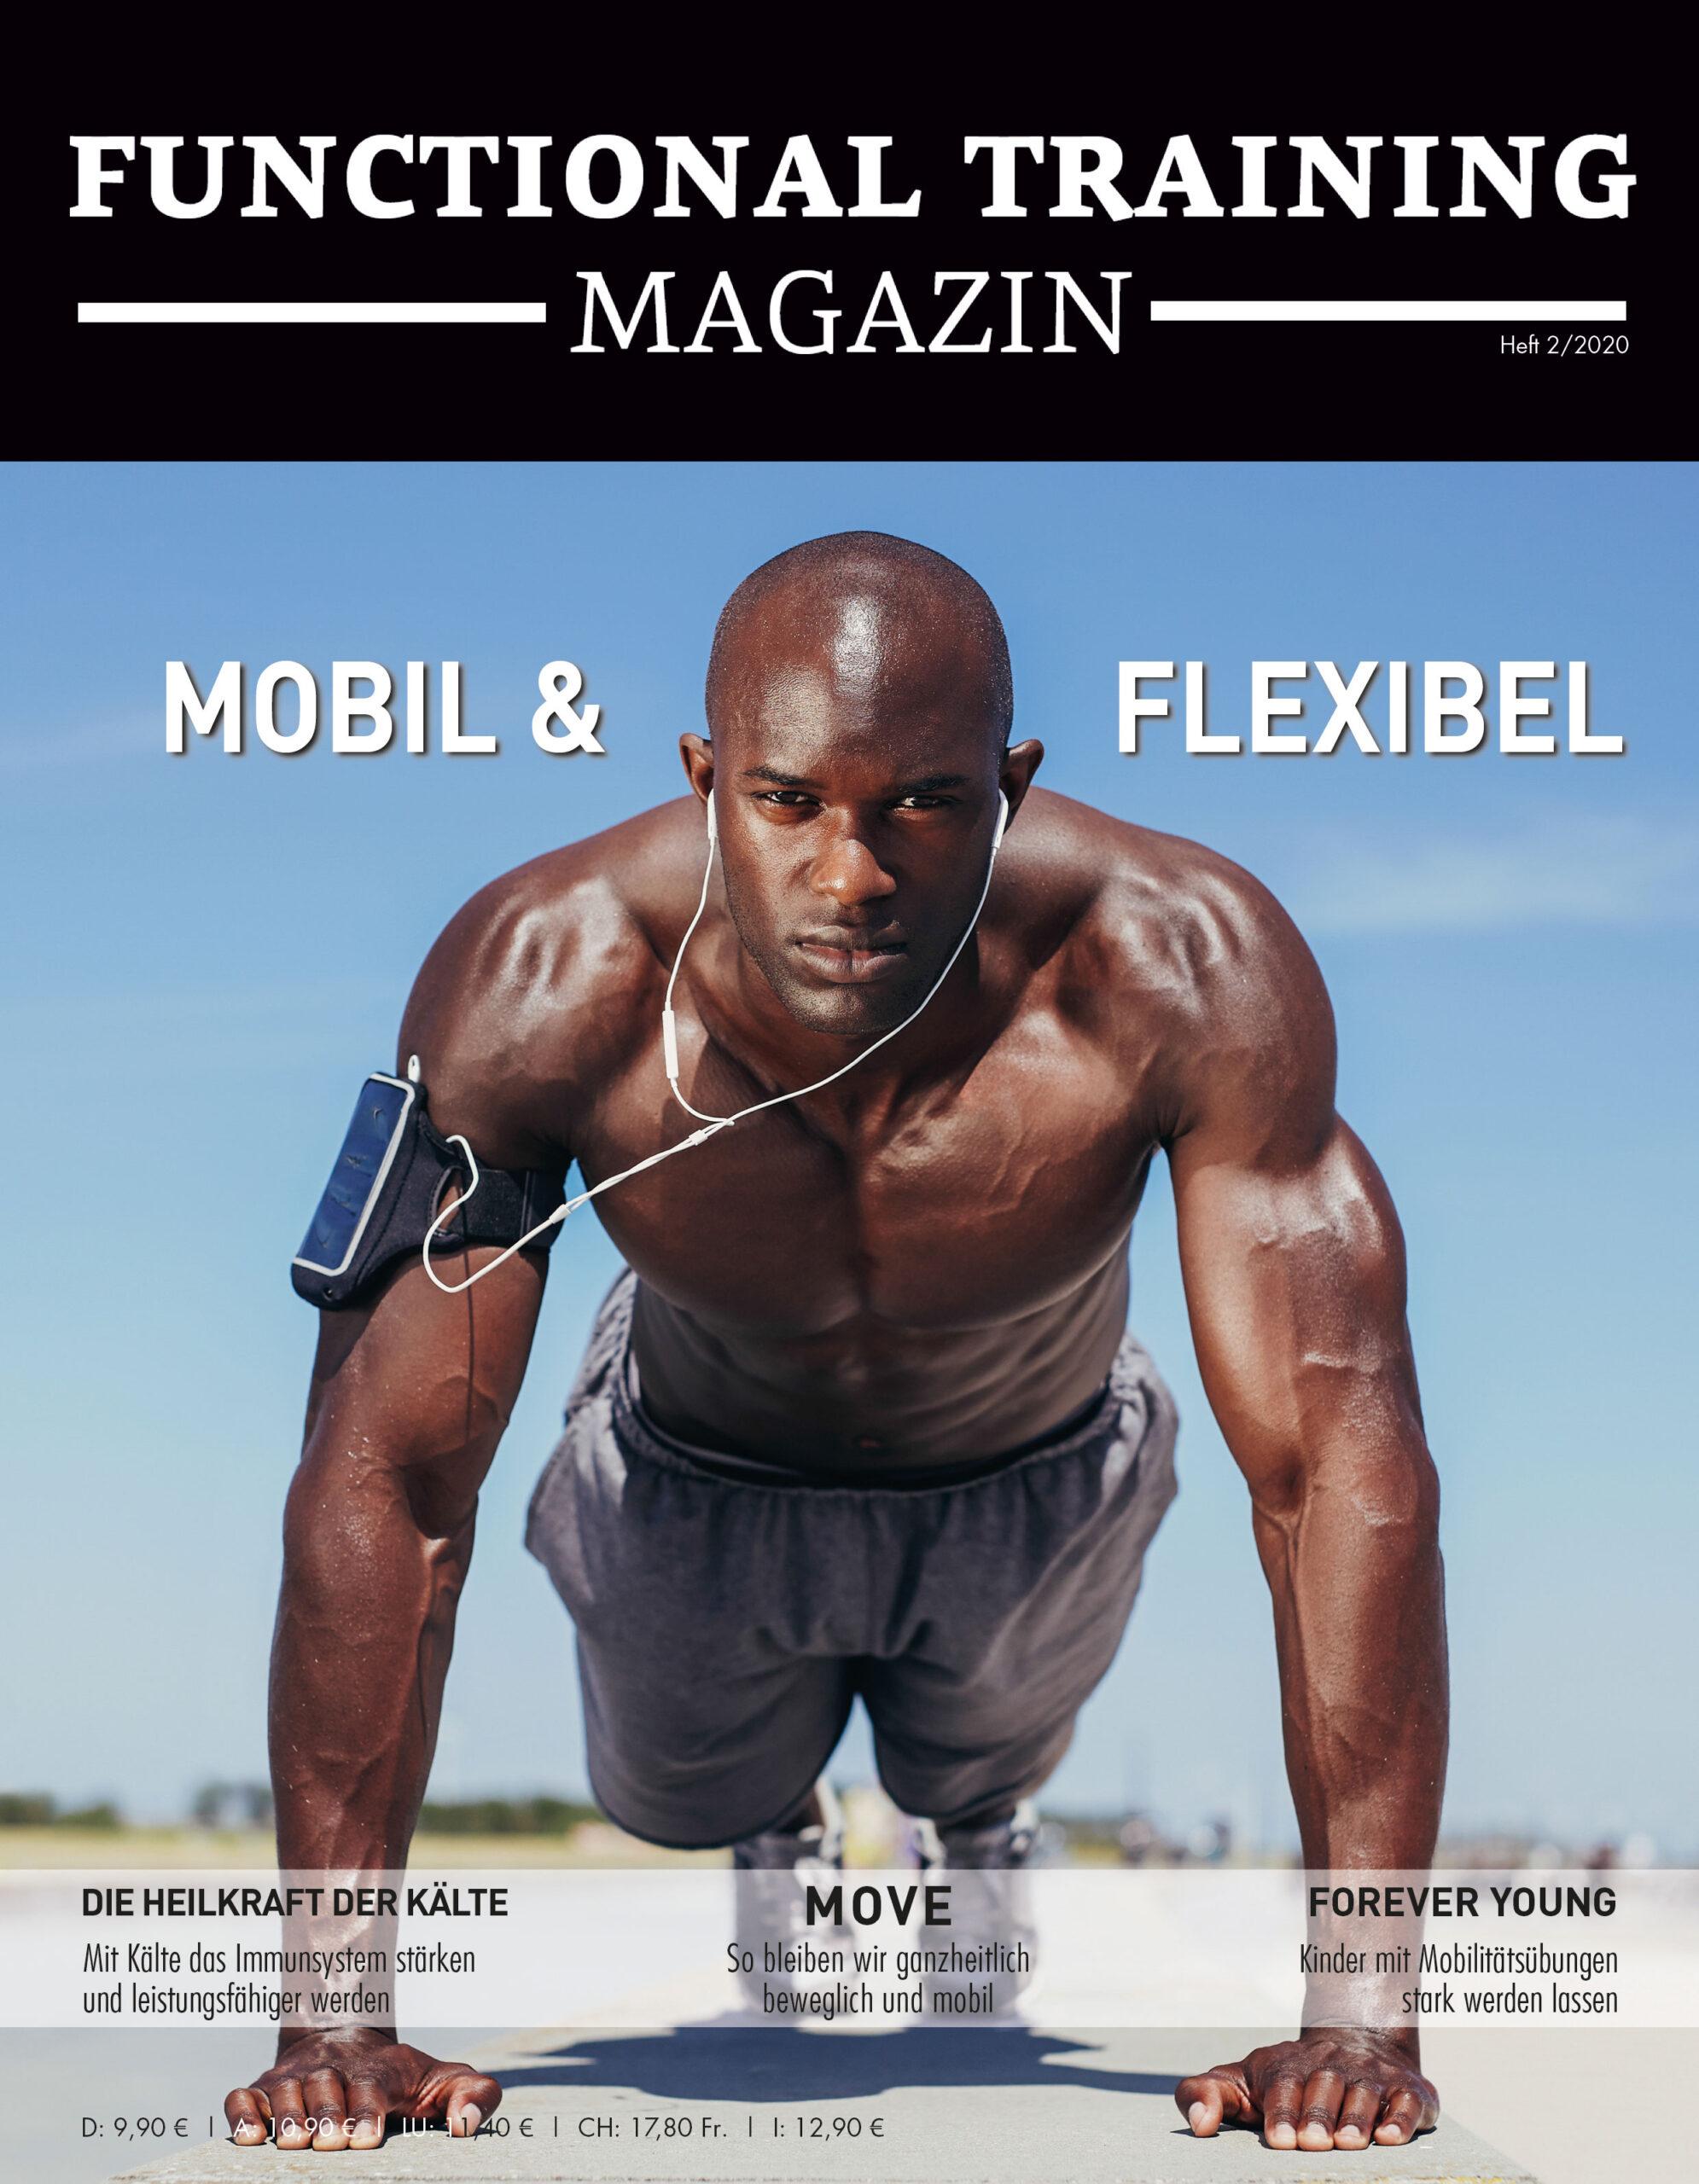 ftm-ausgabe-2-2020-cover-mobil-flexibel-functional-training-magazin